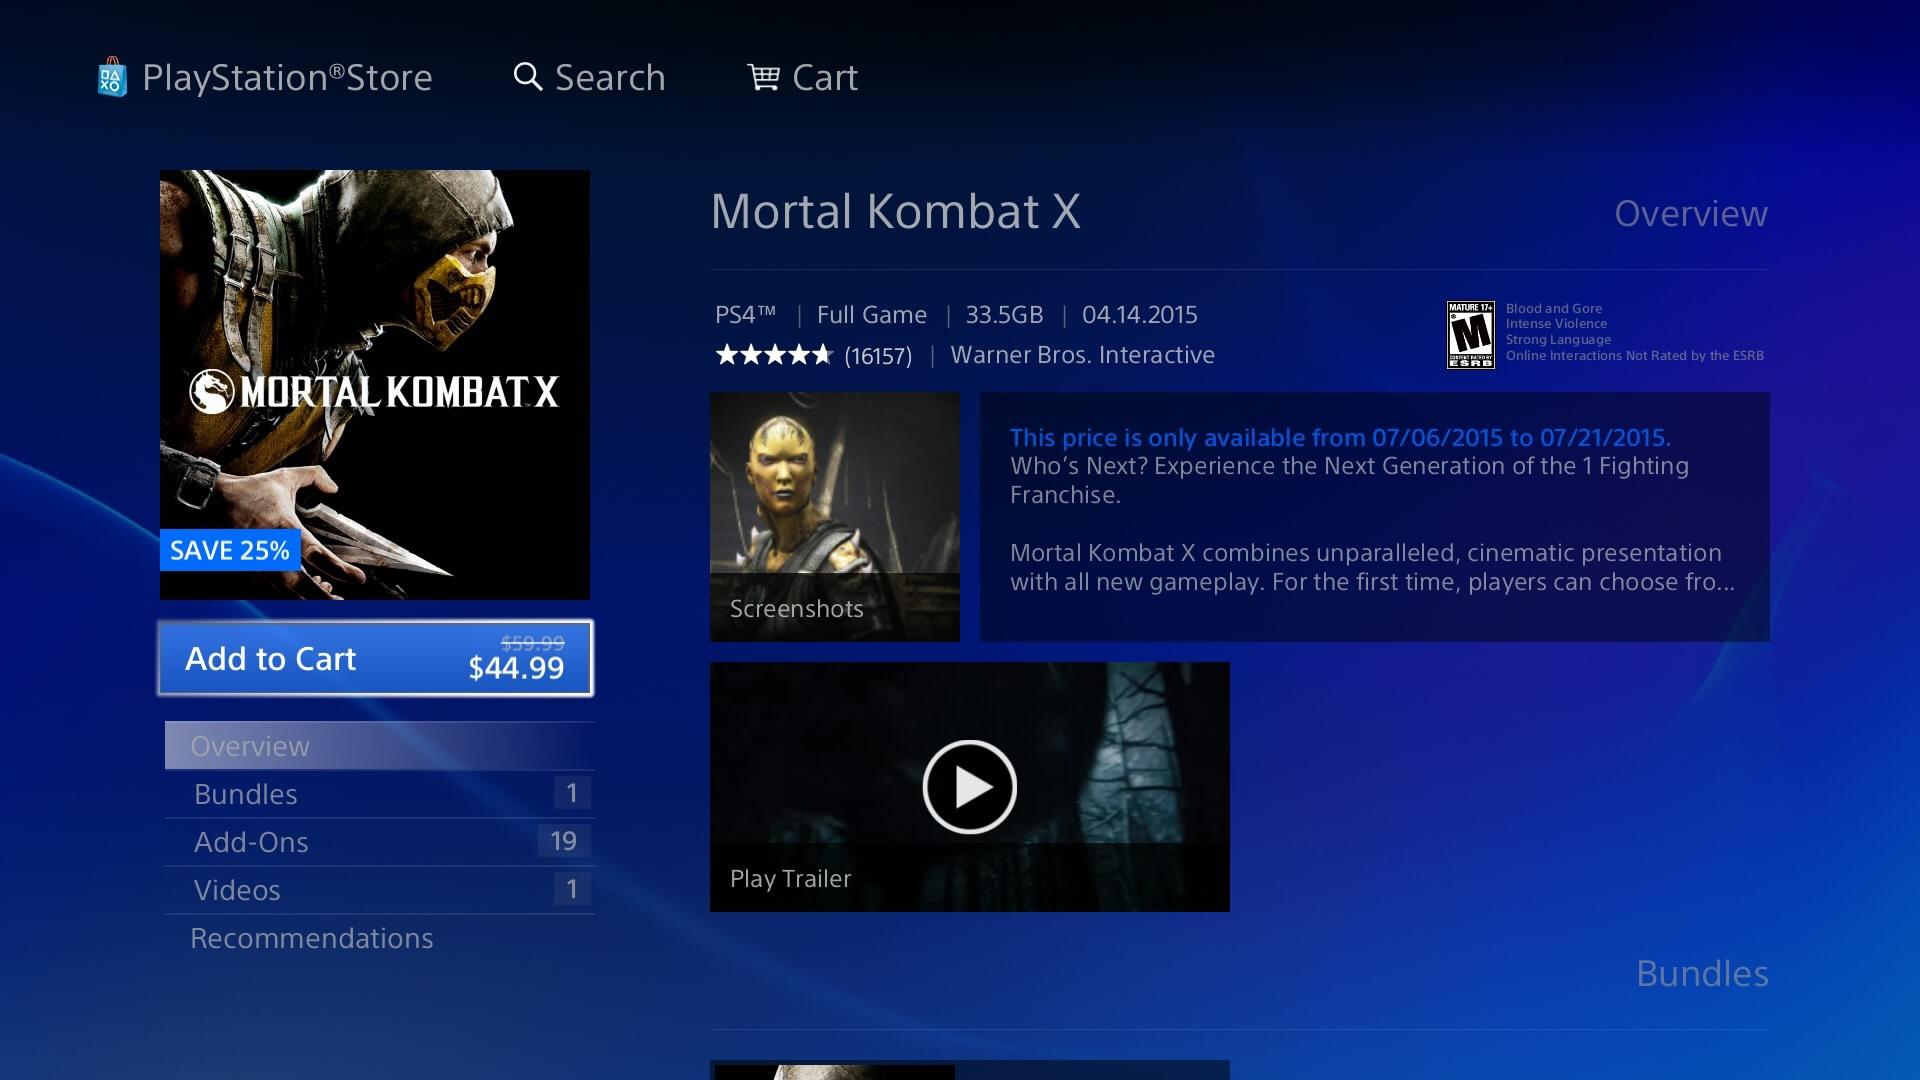 Original PS4 Store